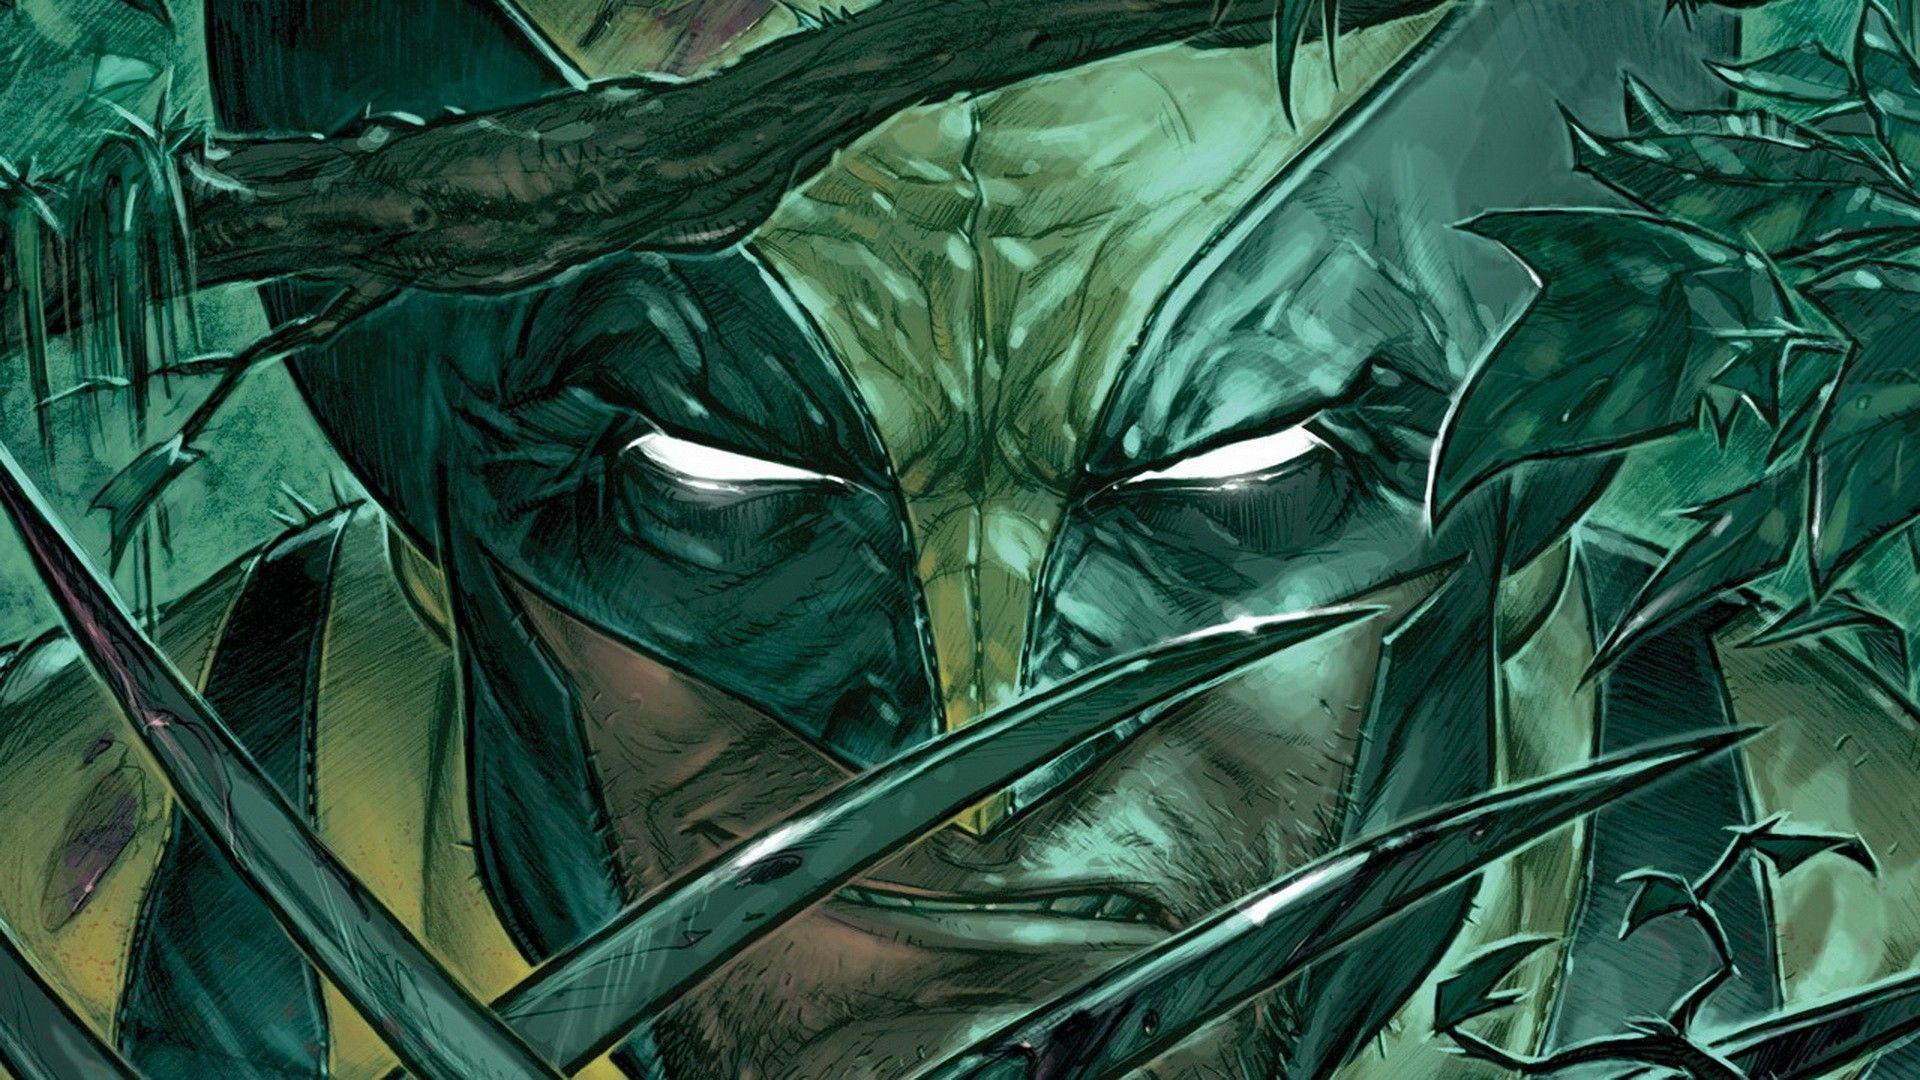 Comics X Men Wolverine Artwork Marvel 1920x1080 Wallpaper